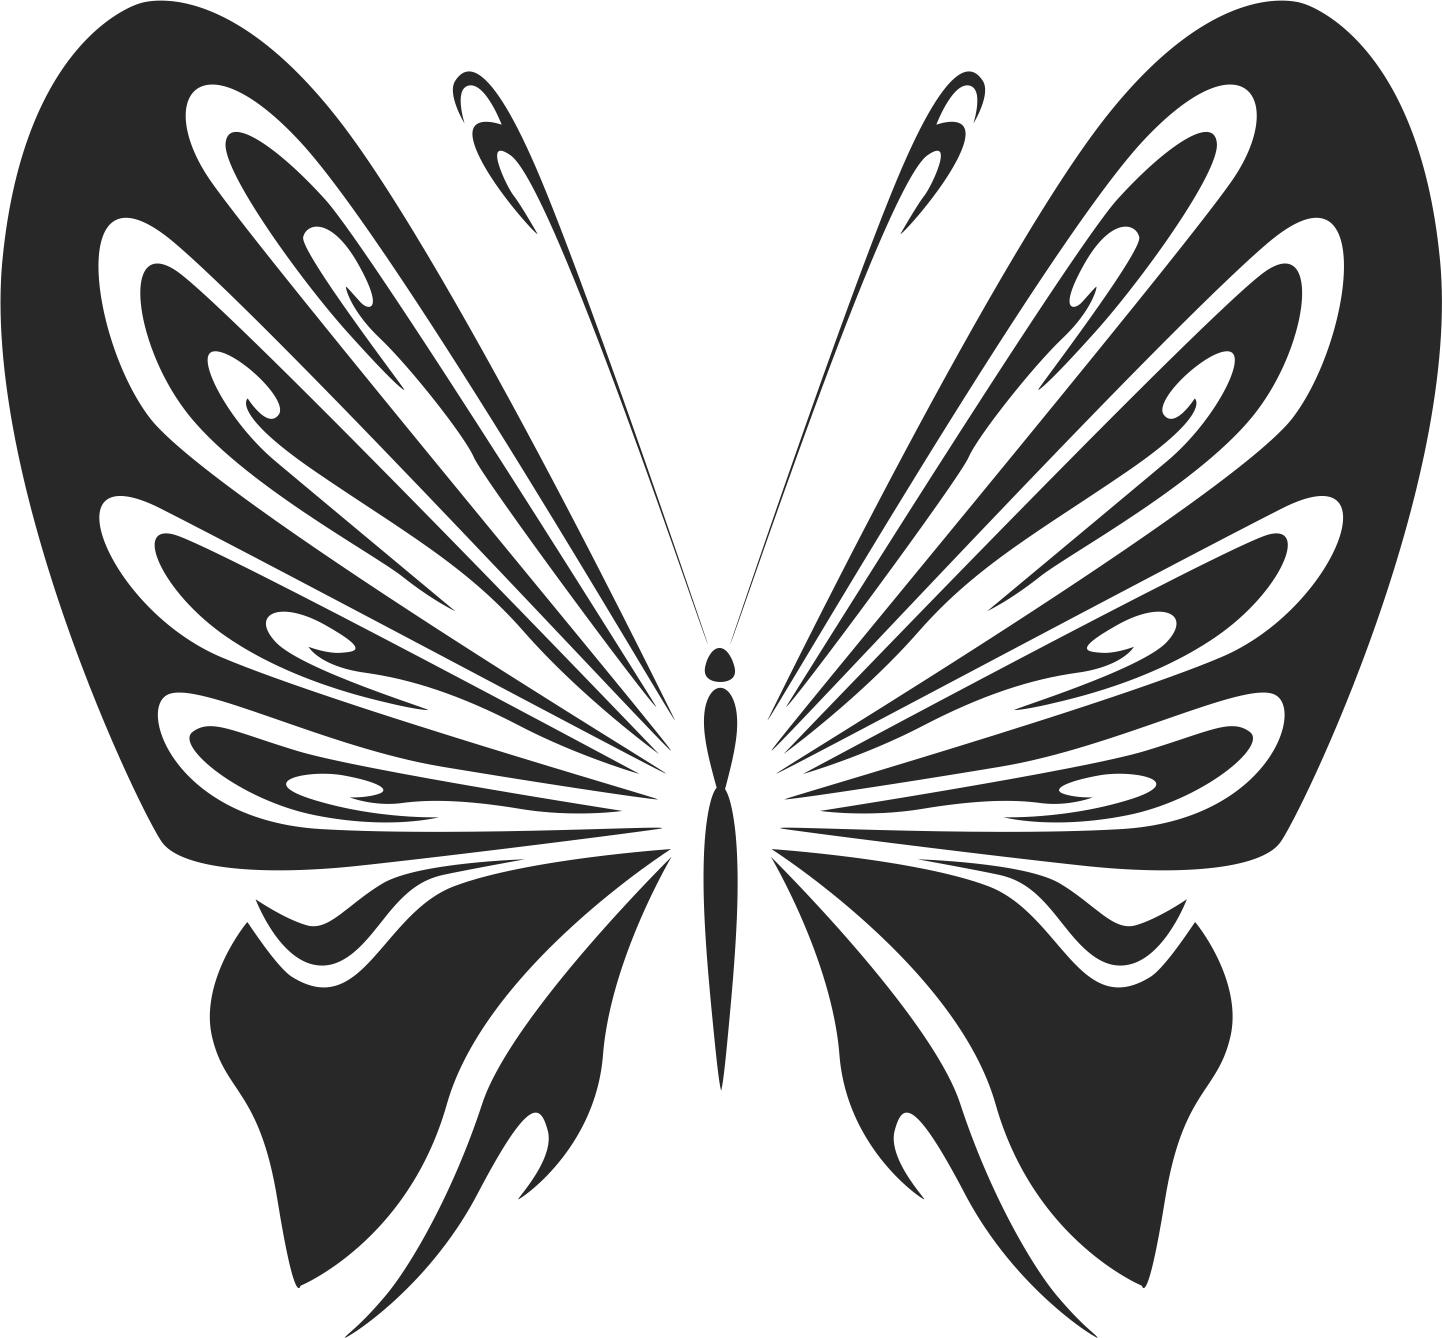 Vintage Butterfly Stencils Free CDR Vectors Art